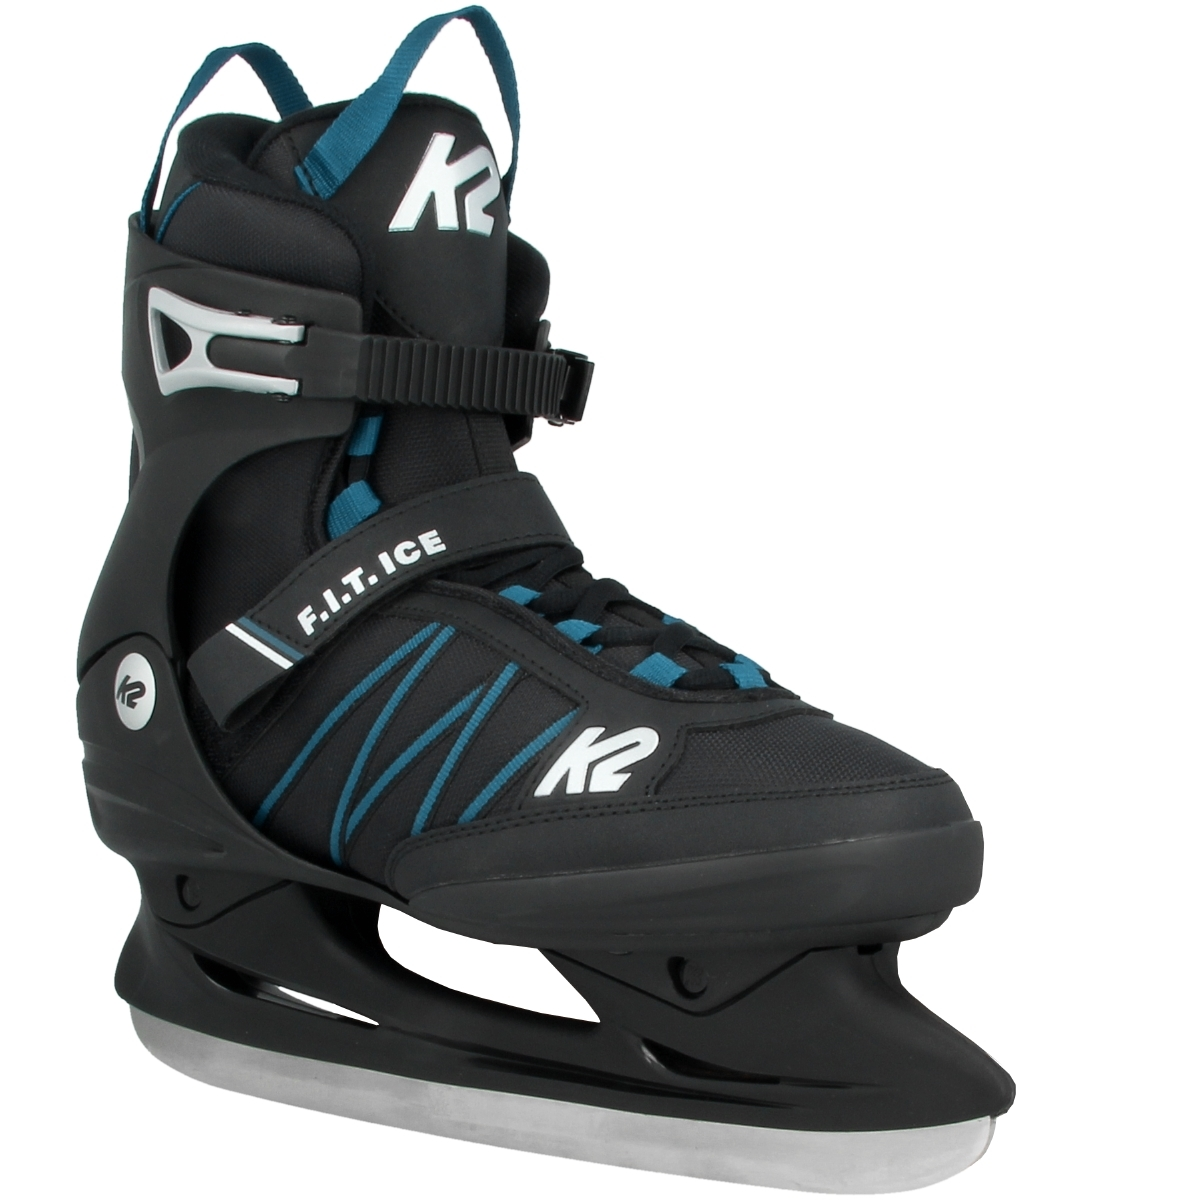 K2 F.I.T Ice Pro M Schlittschuhe Eislaufen Eishockey Winter Schuhe 25E0302